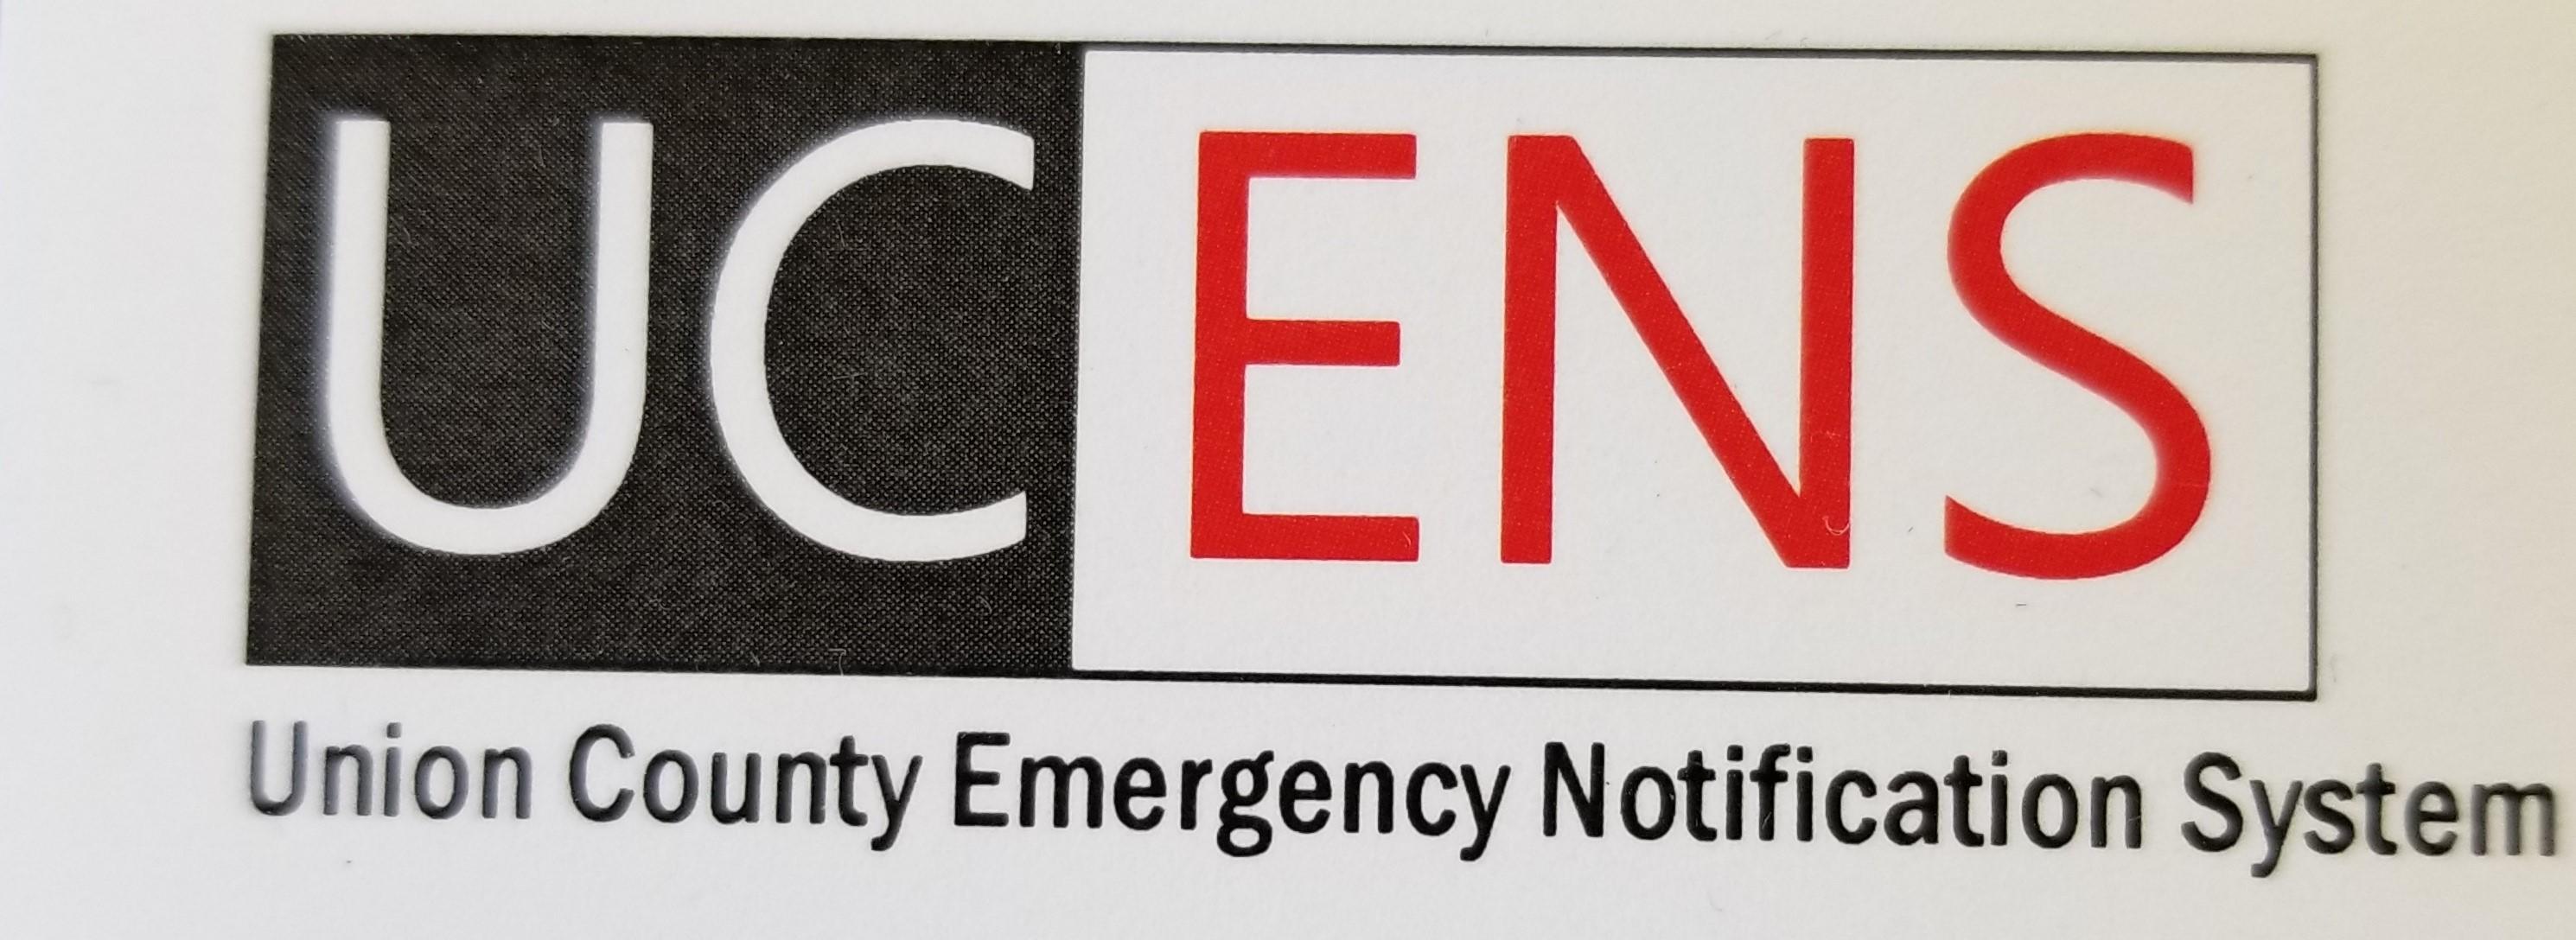 Emergency Notification Alerts